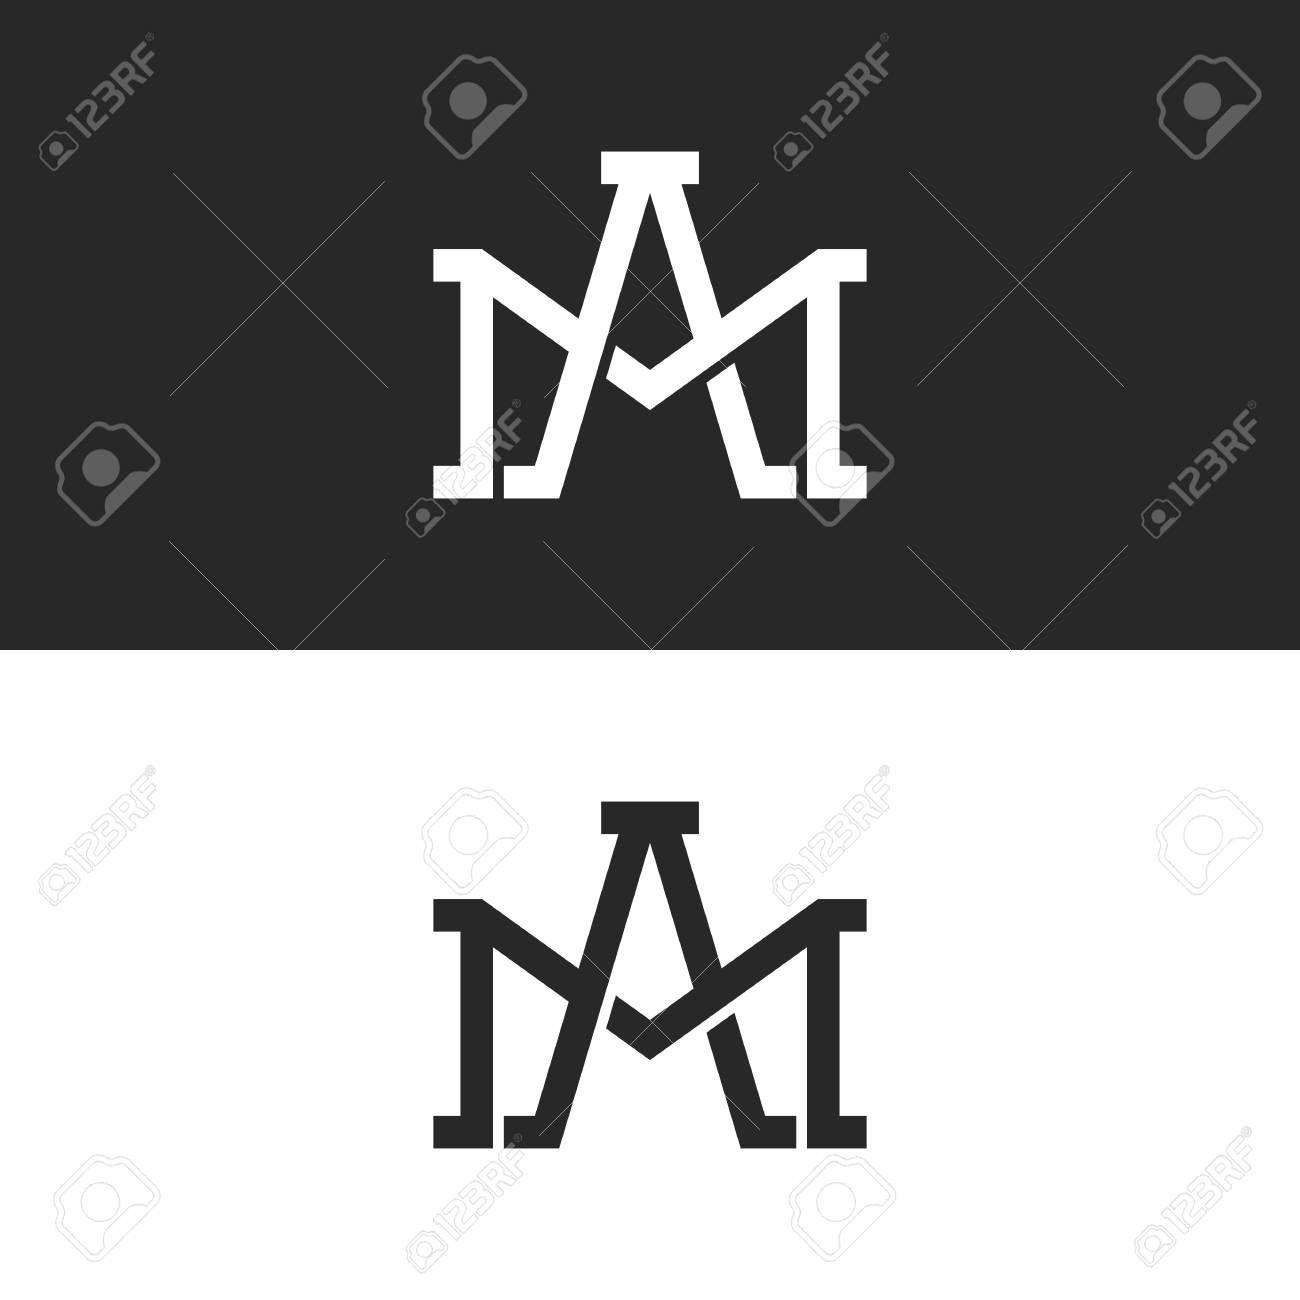 Monogram initials AM or MA letters logo design mockup